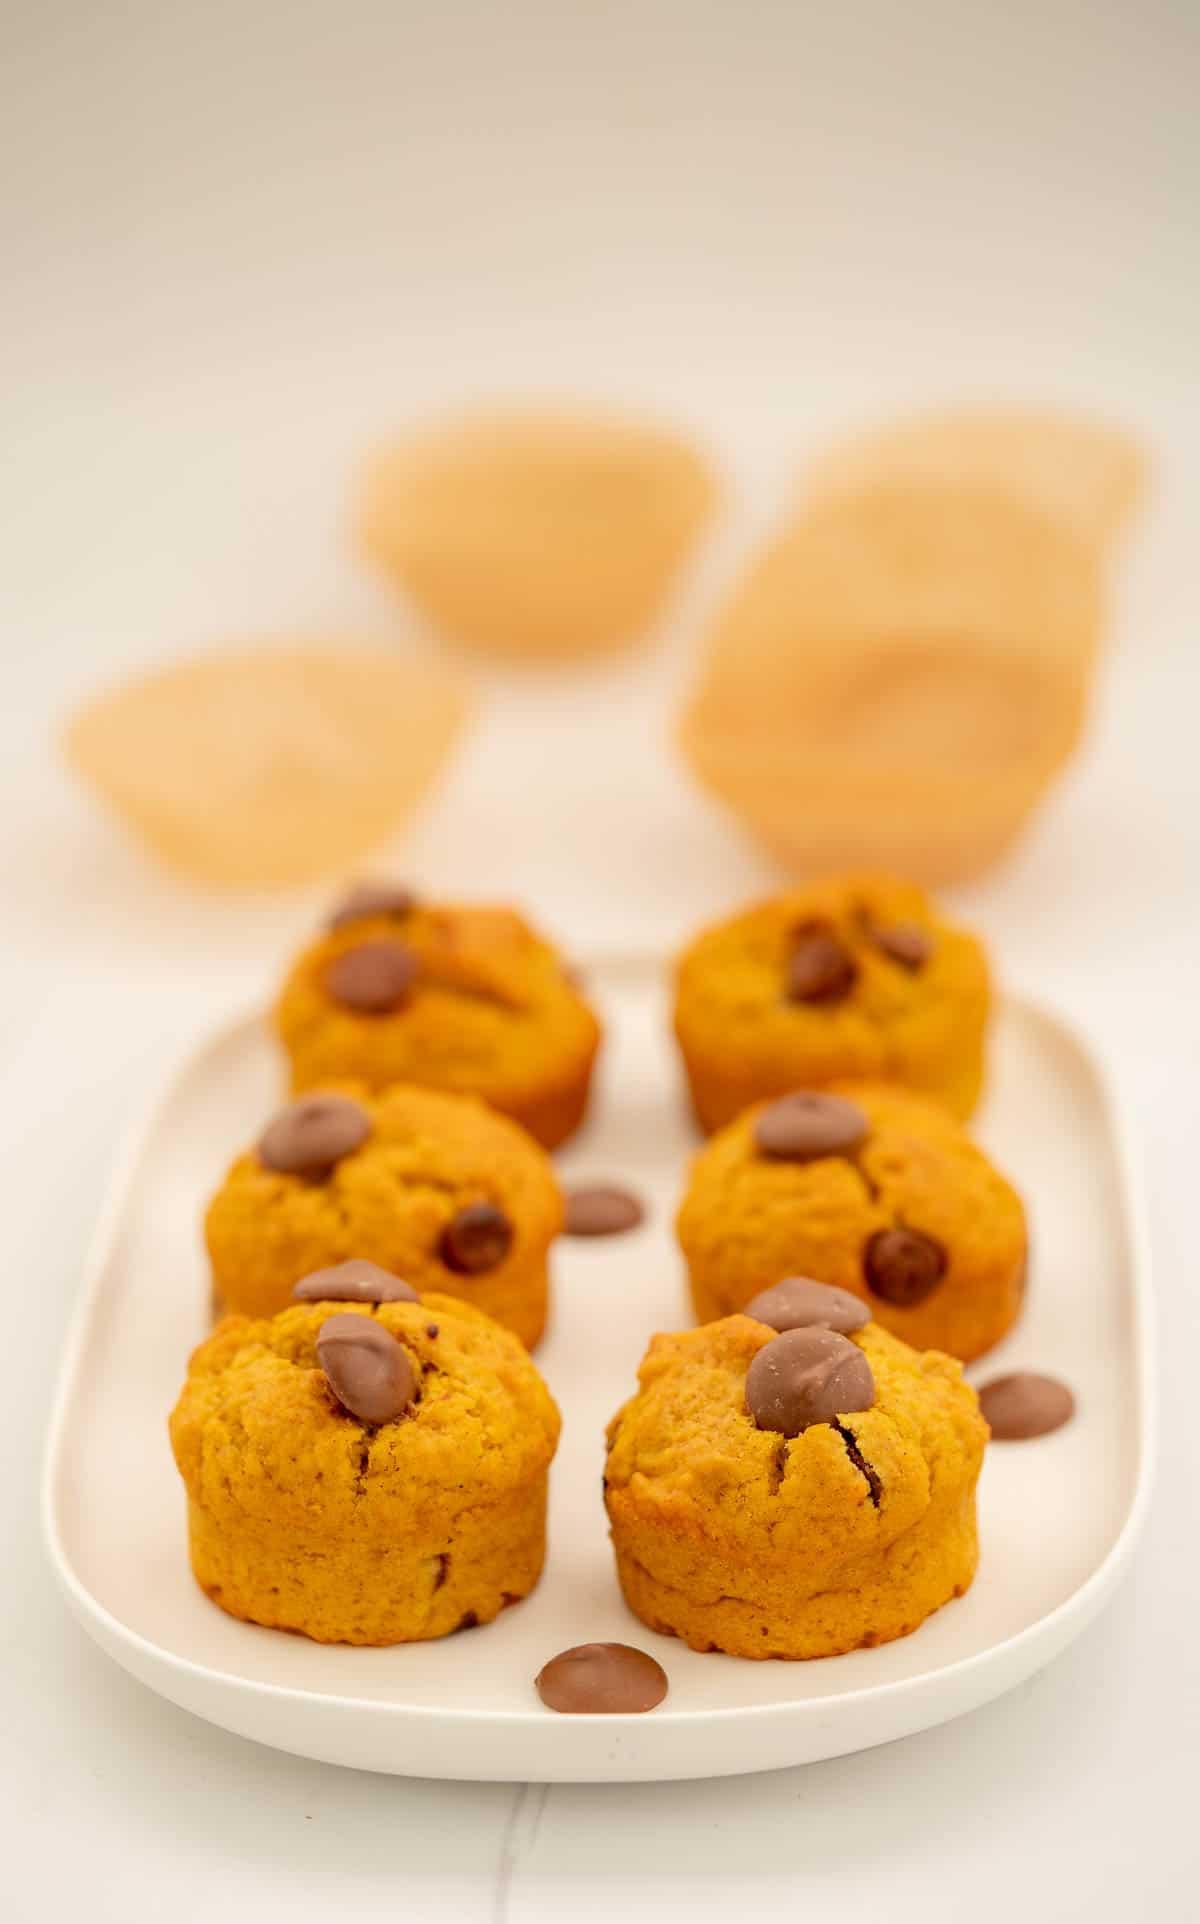 6 pumpkin chocolate chip muffins on a white rectangular serving plate.